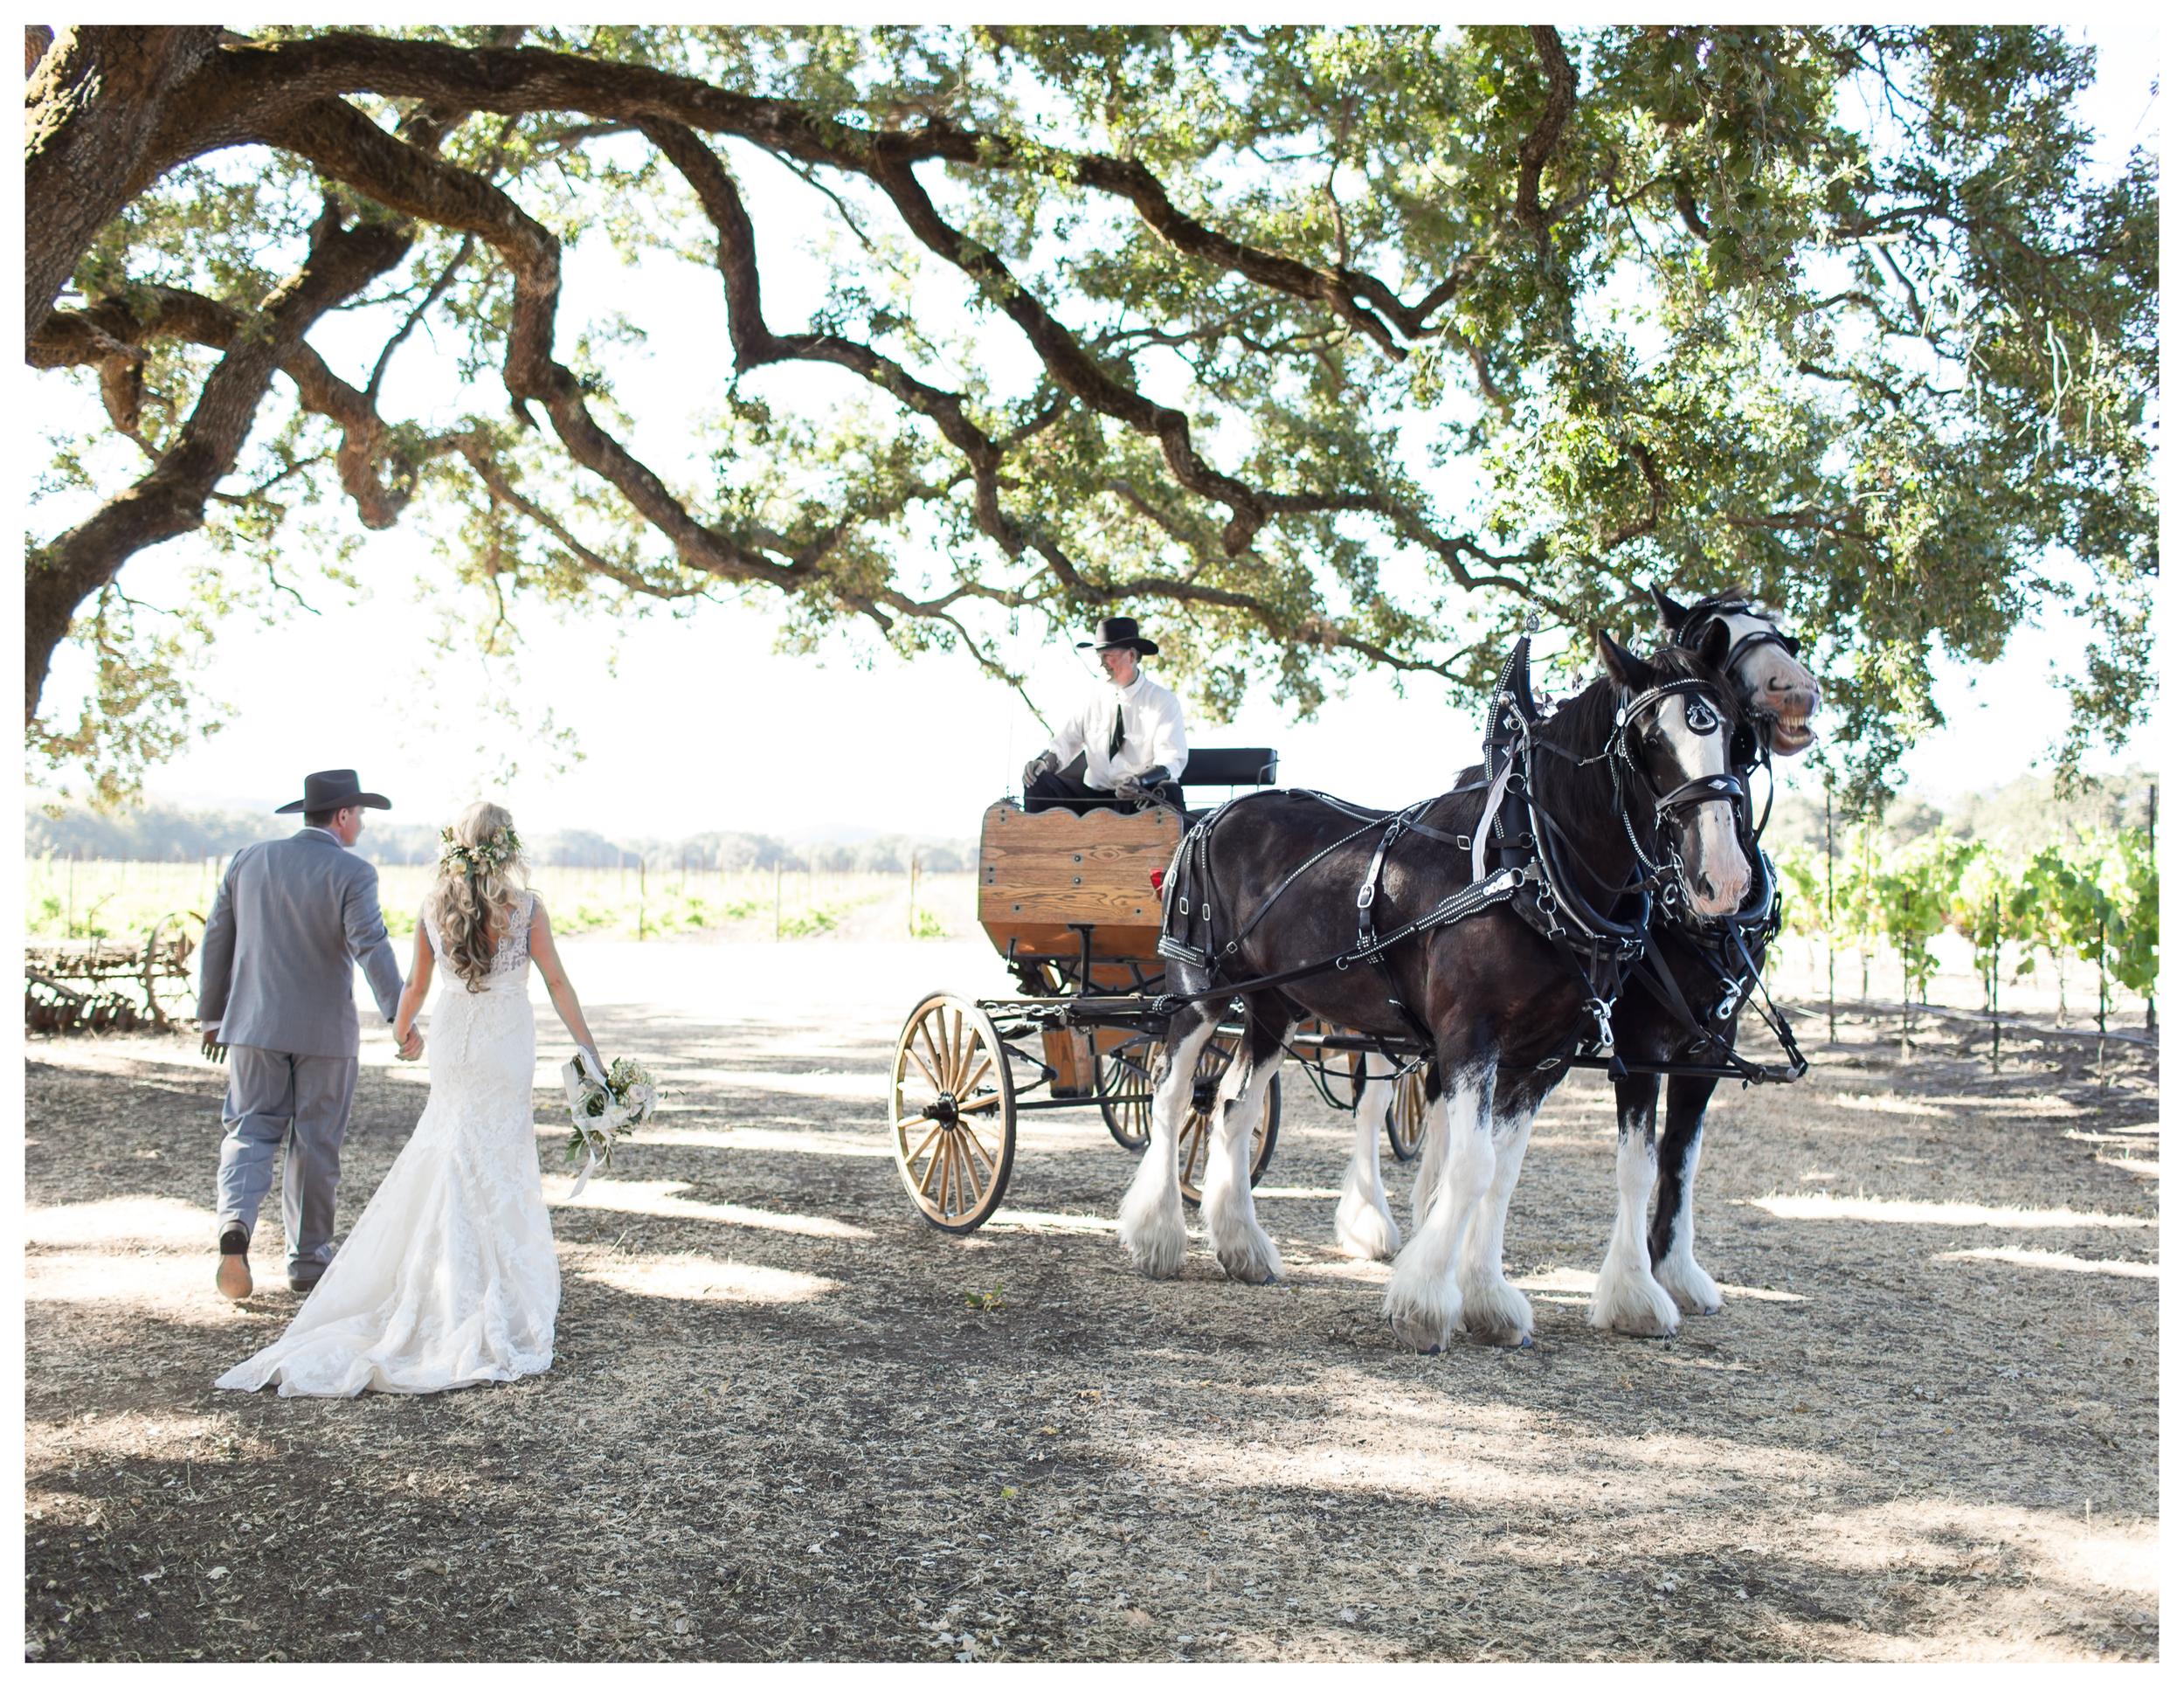 sonoma ranch wedding 1.jpg